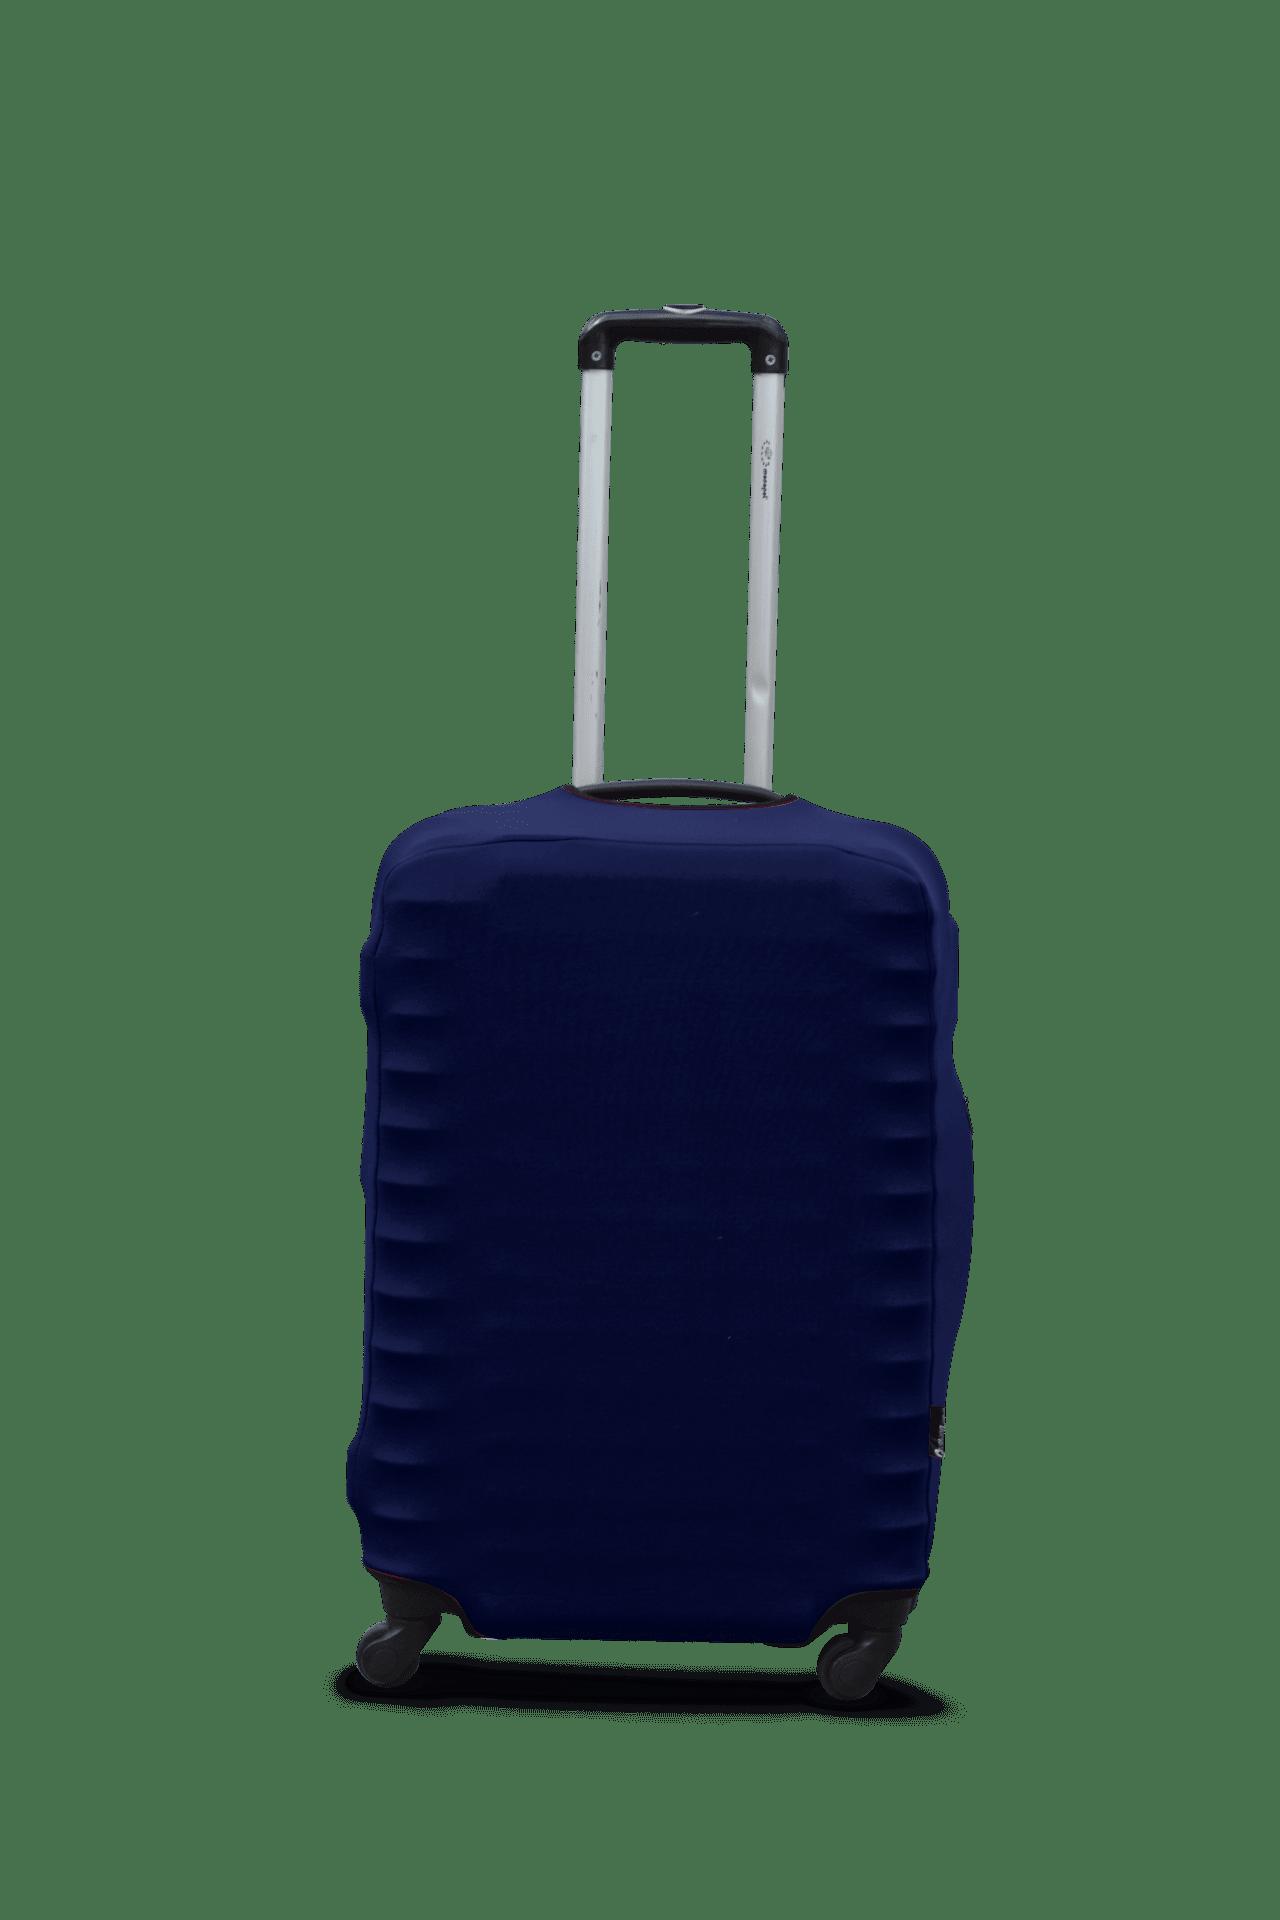 Husa pentru valiza daiving Cover DAWING S BLUE